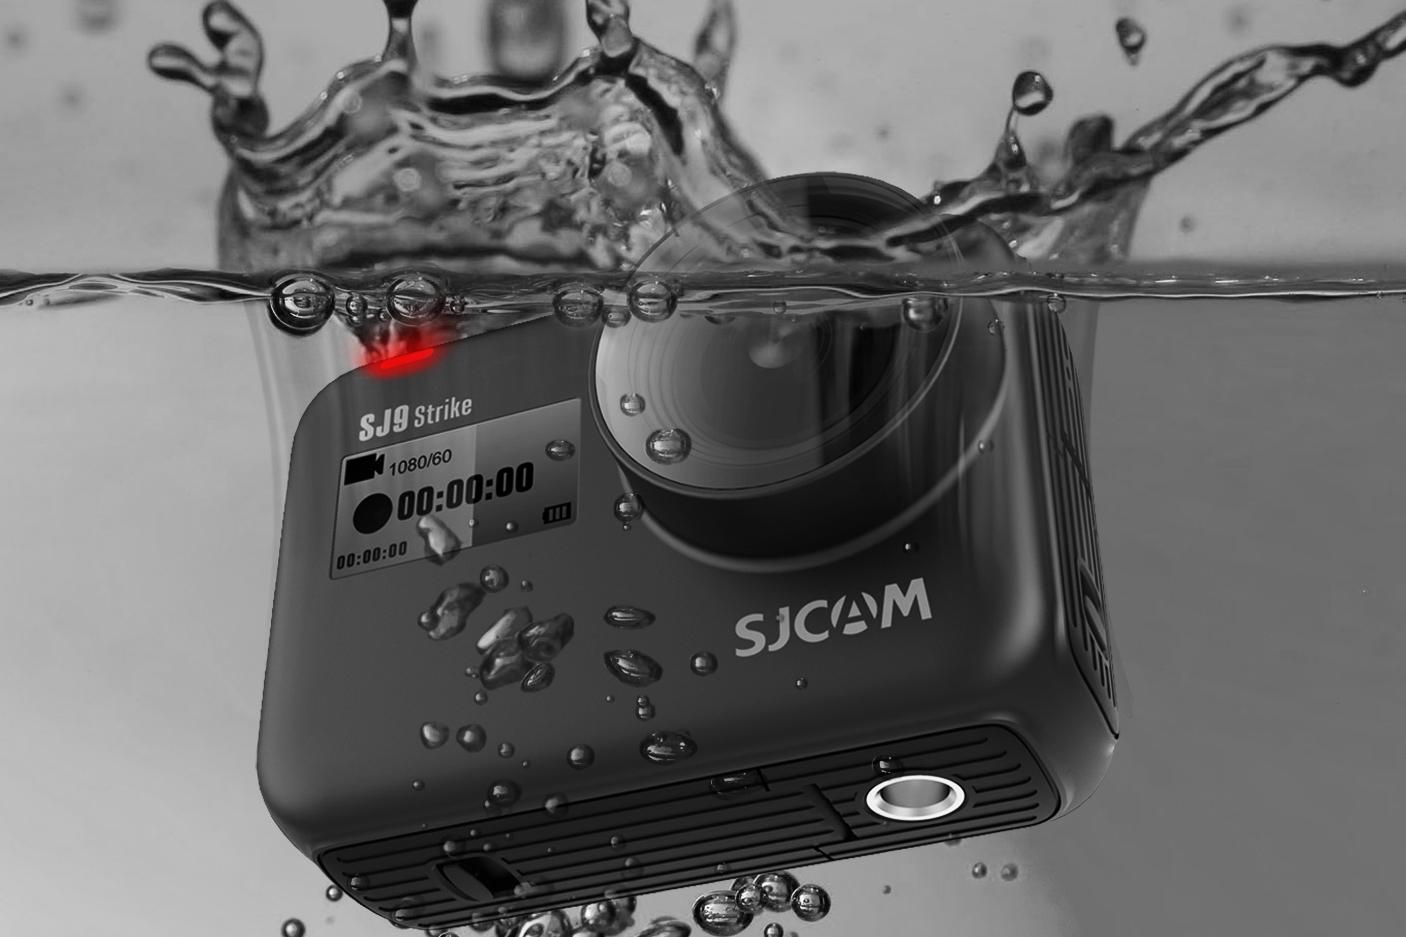 SJCAM launches SJ9 Strike and SJ9 Max action cameras